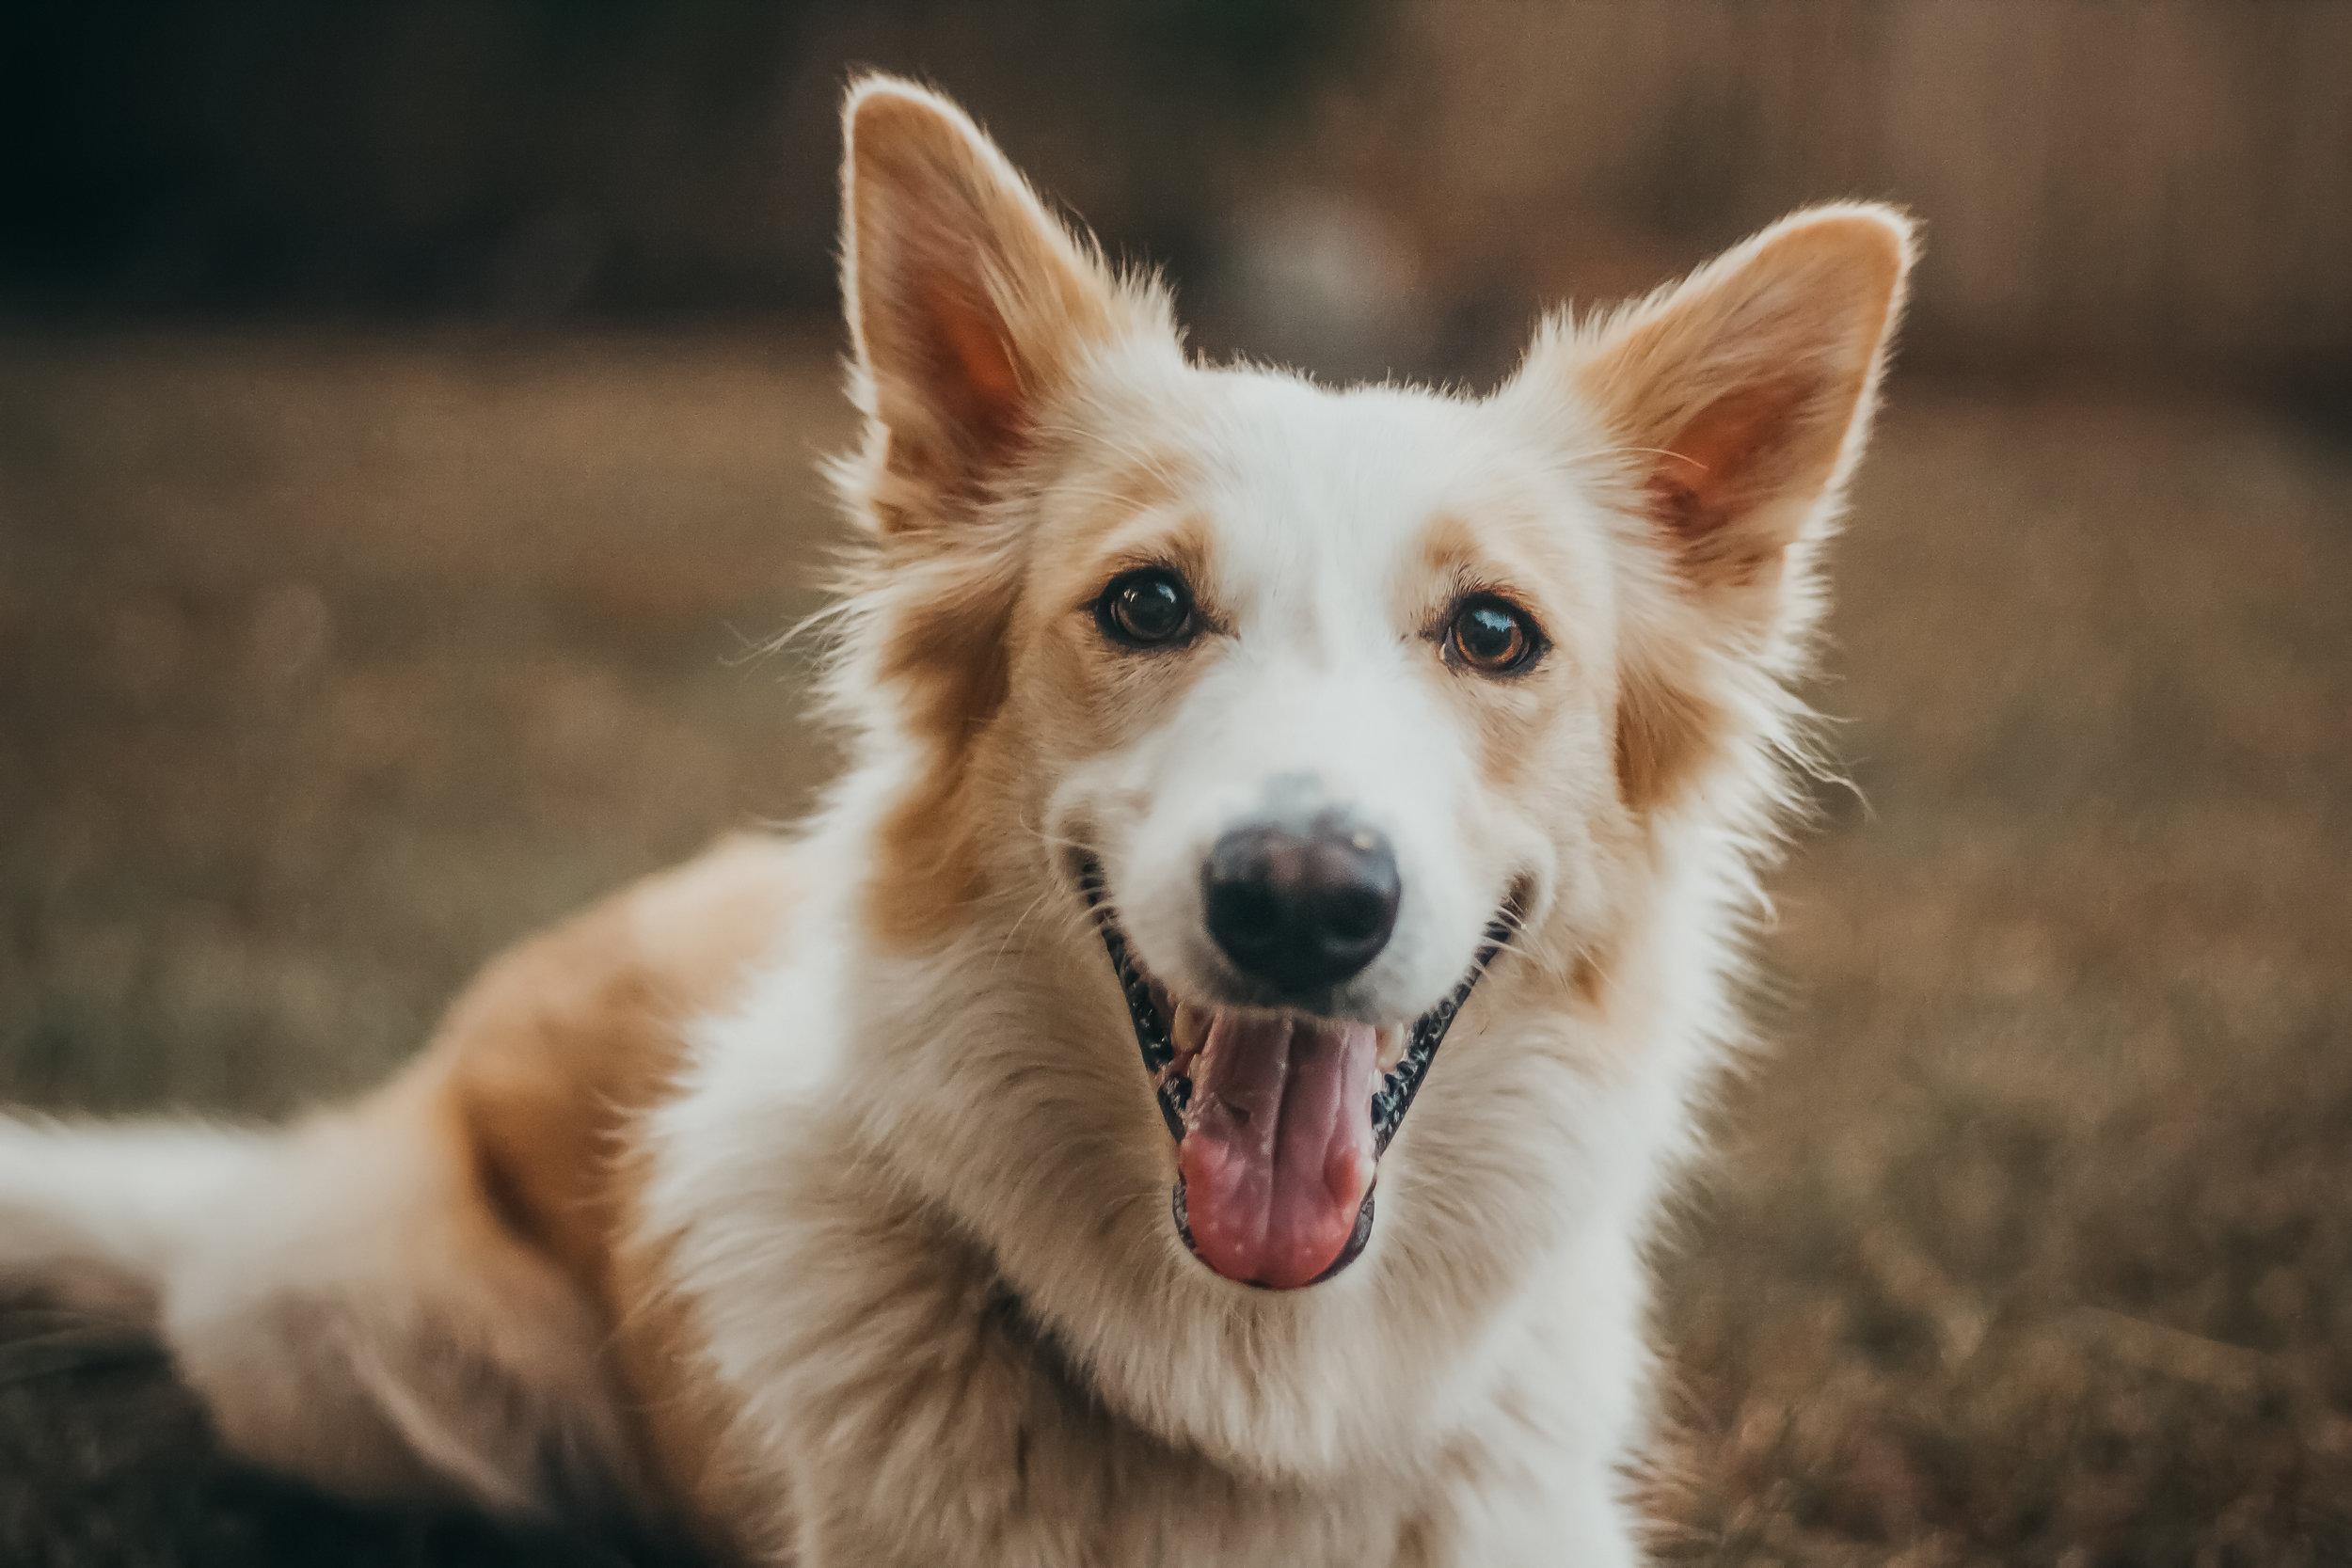 My dog Willow, Jan 31st 2019.